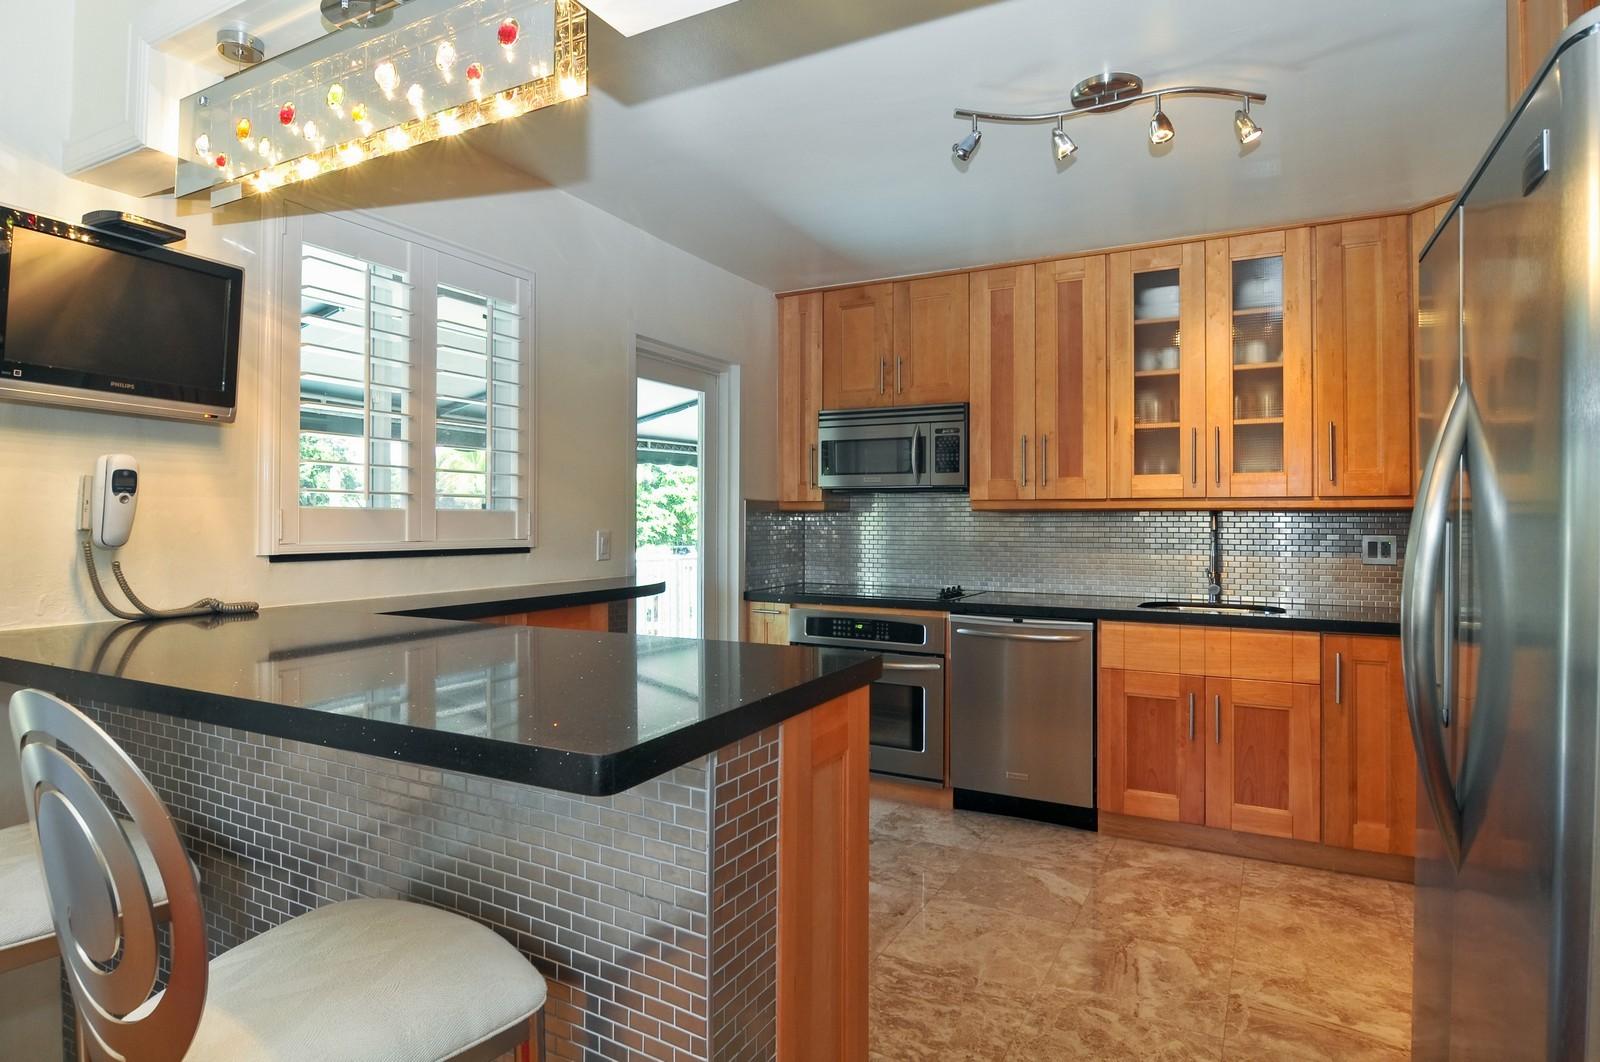 Real Estate Photography - 2010 NE 121st Rd, Miami, FL, 33181 - Kitchen